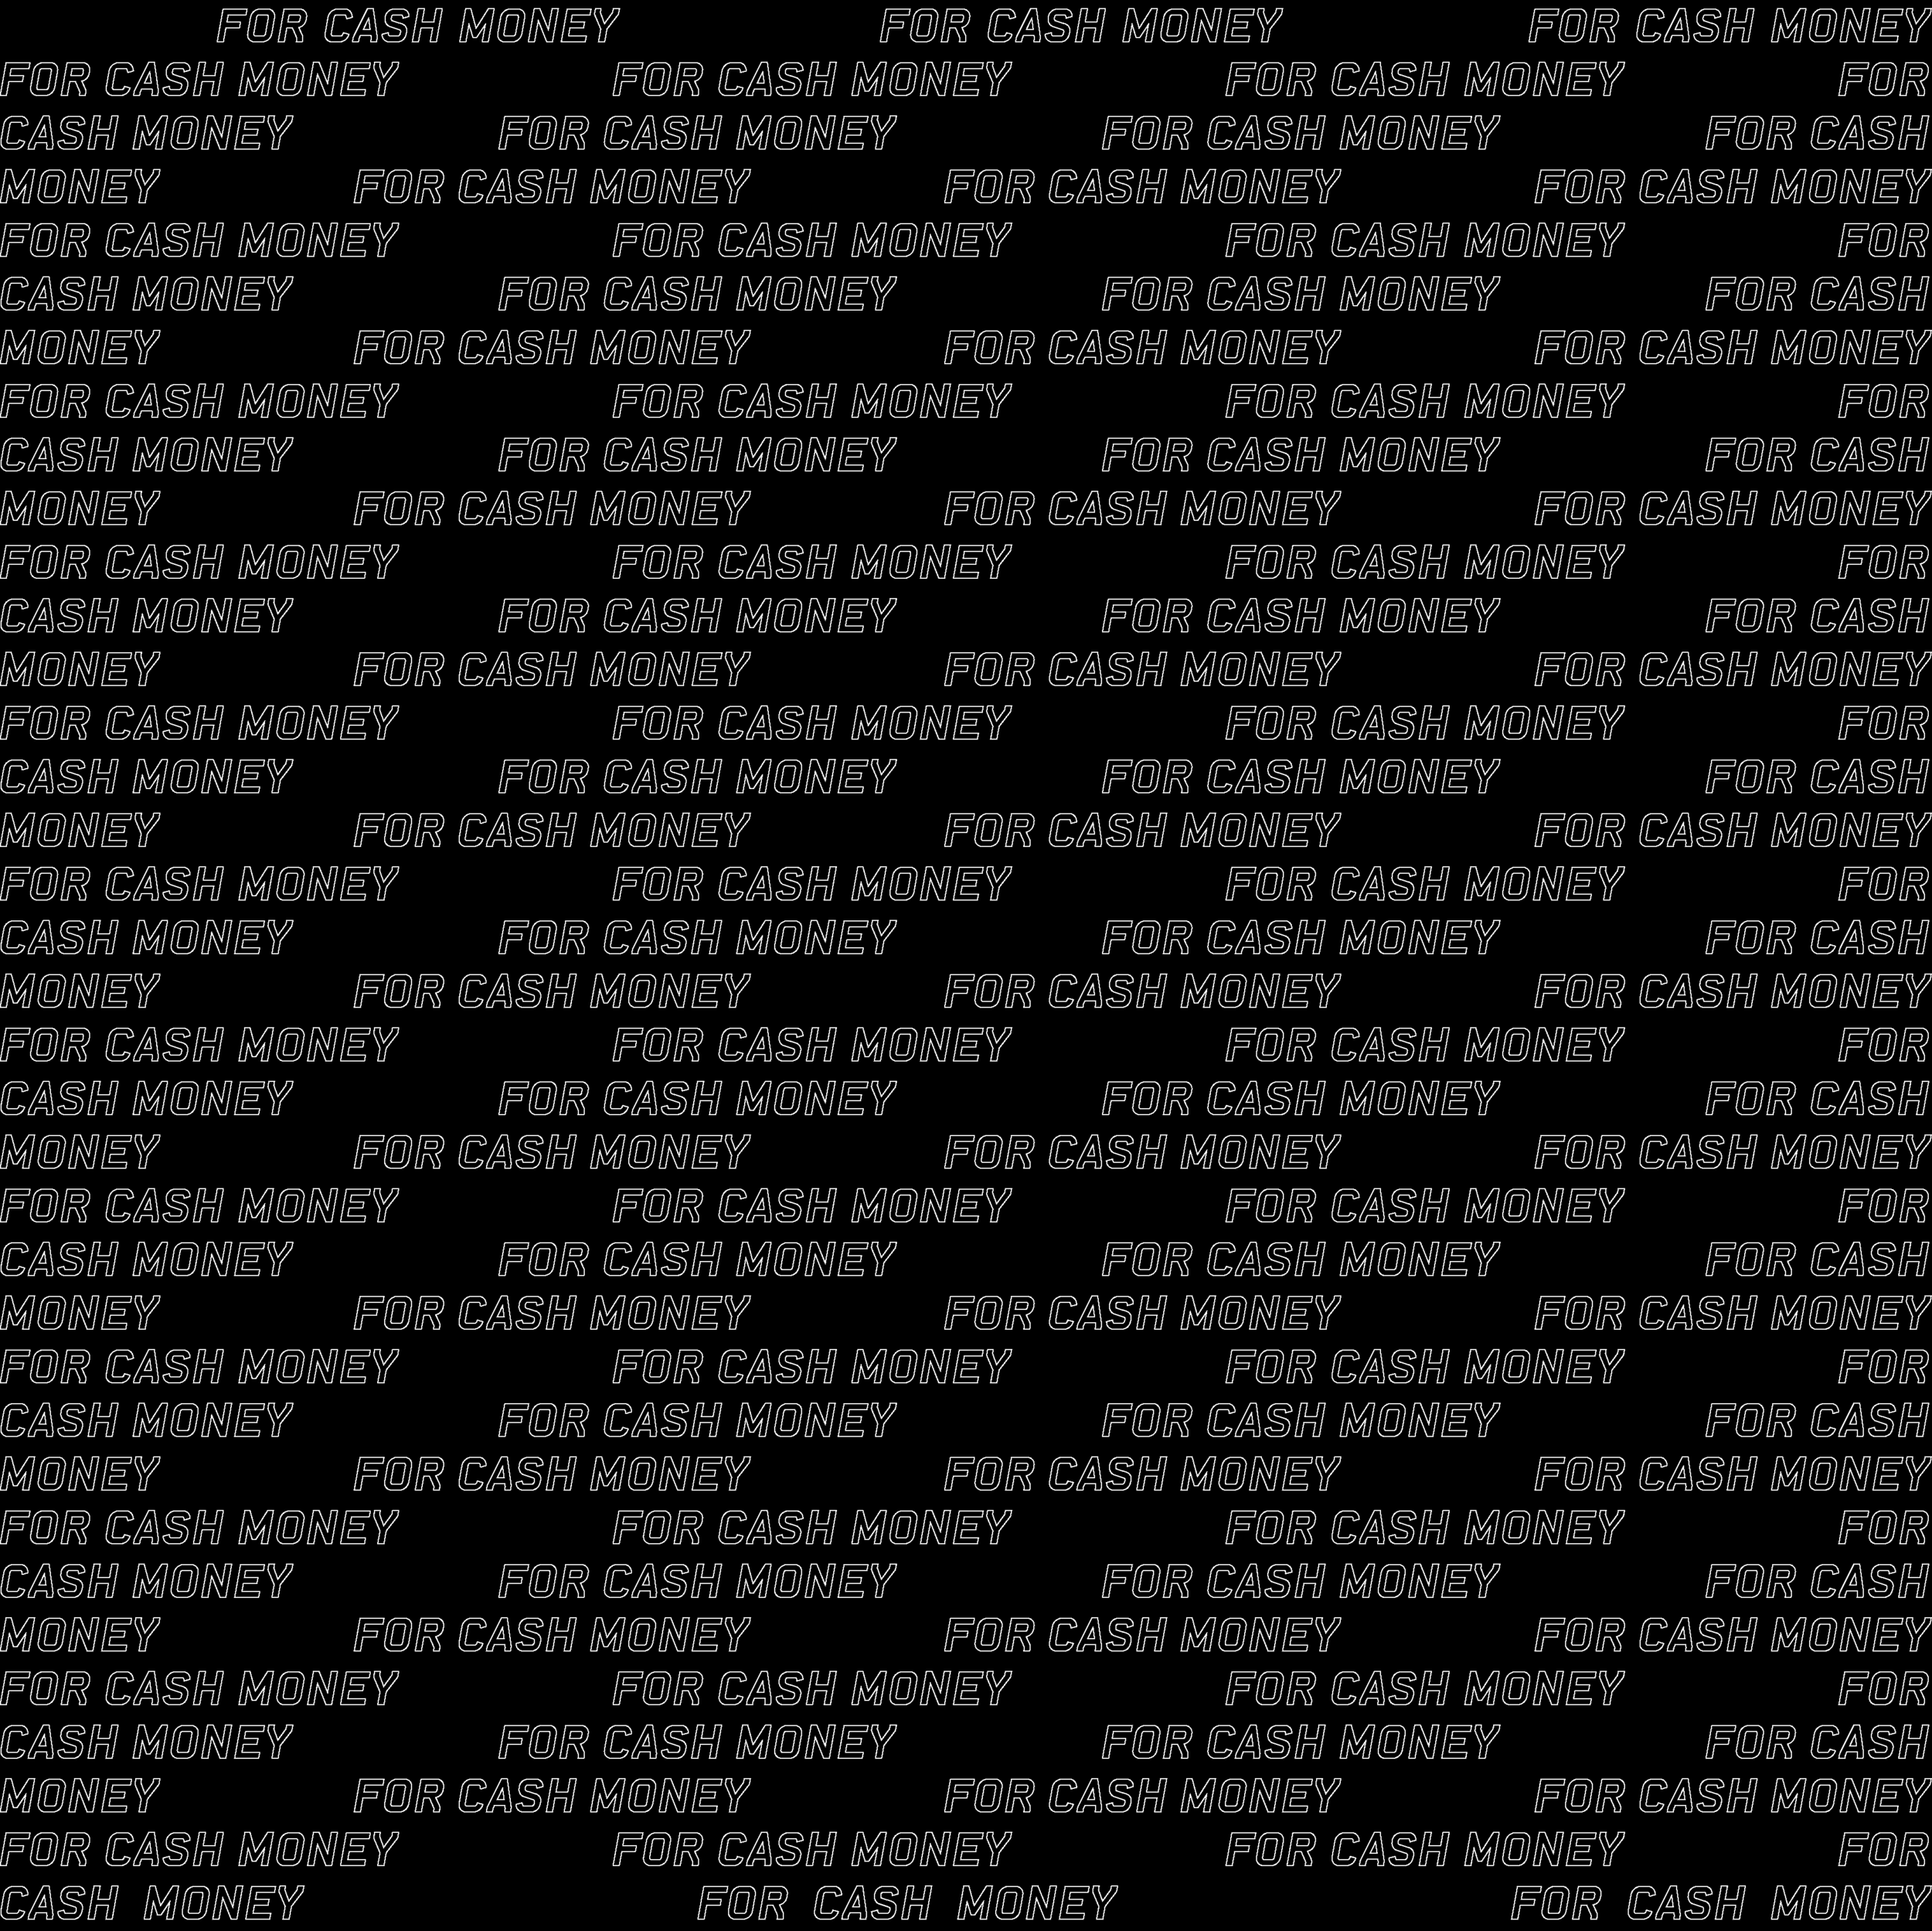 sonic_jeel_visuals-12.png